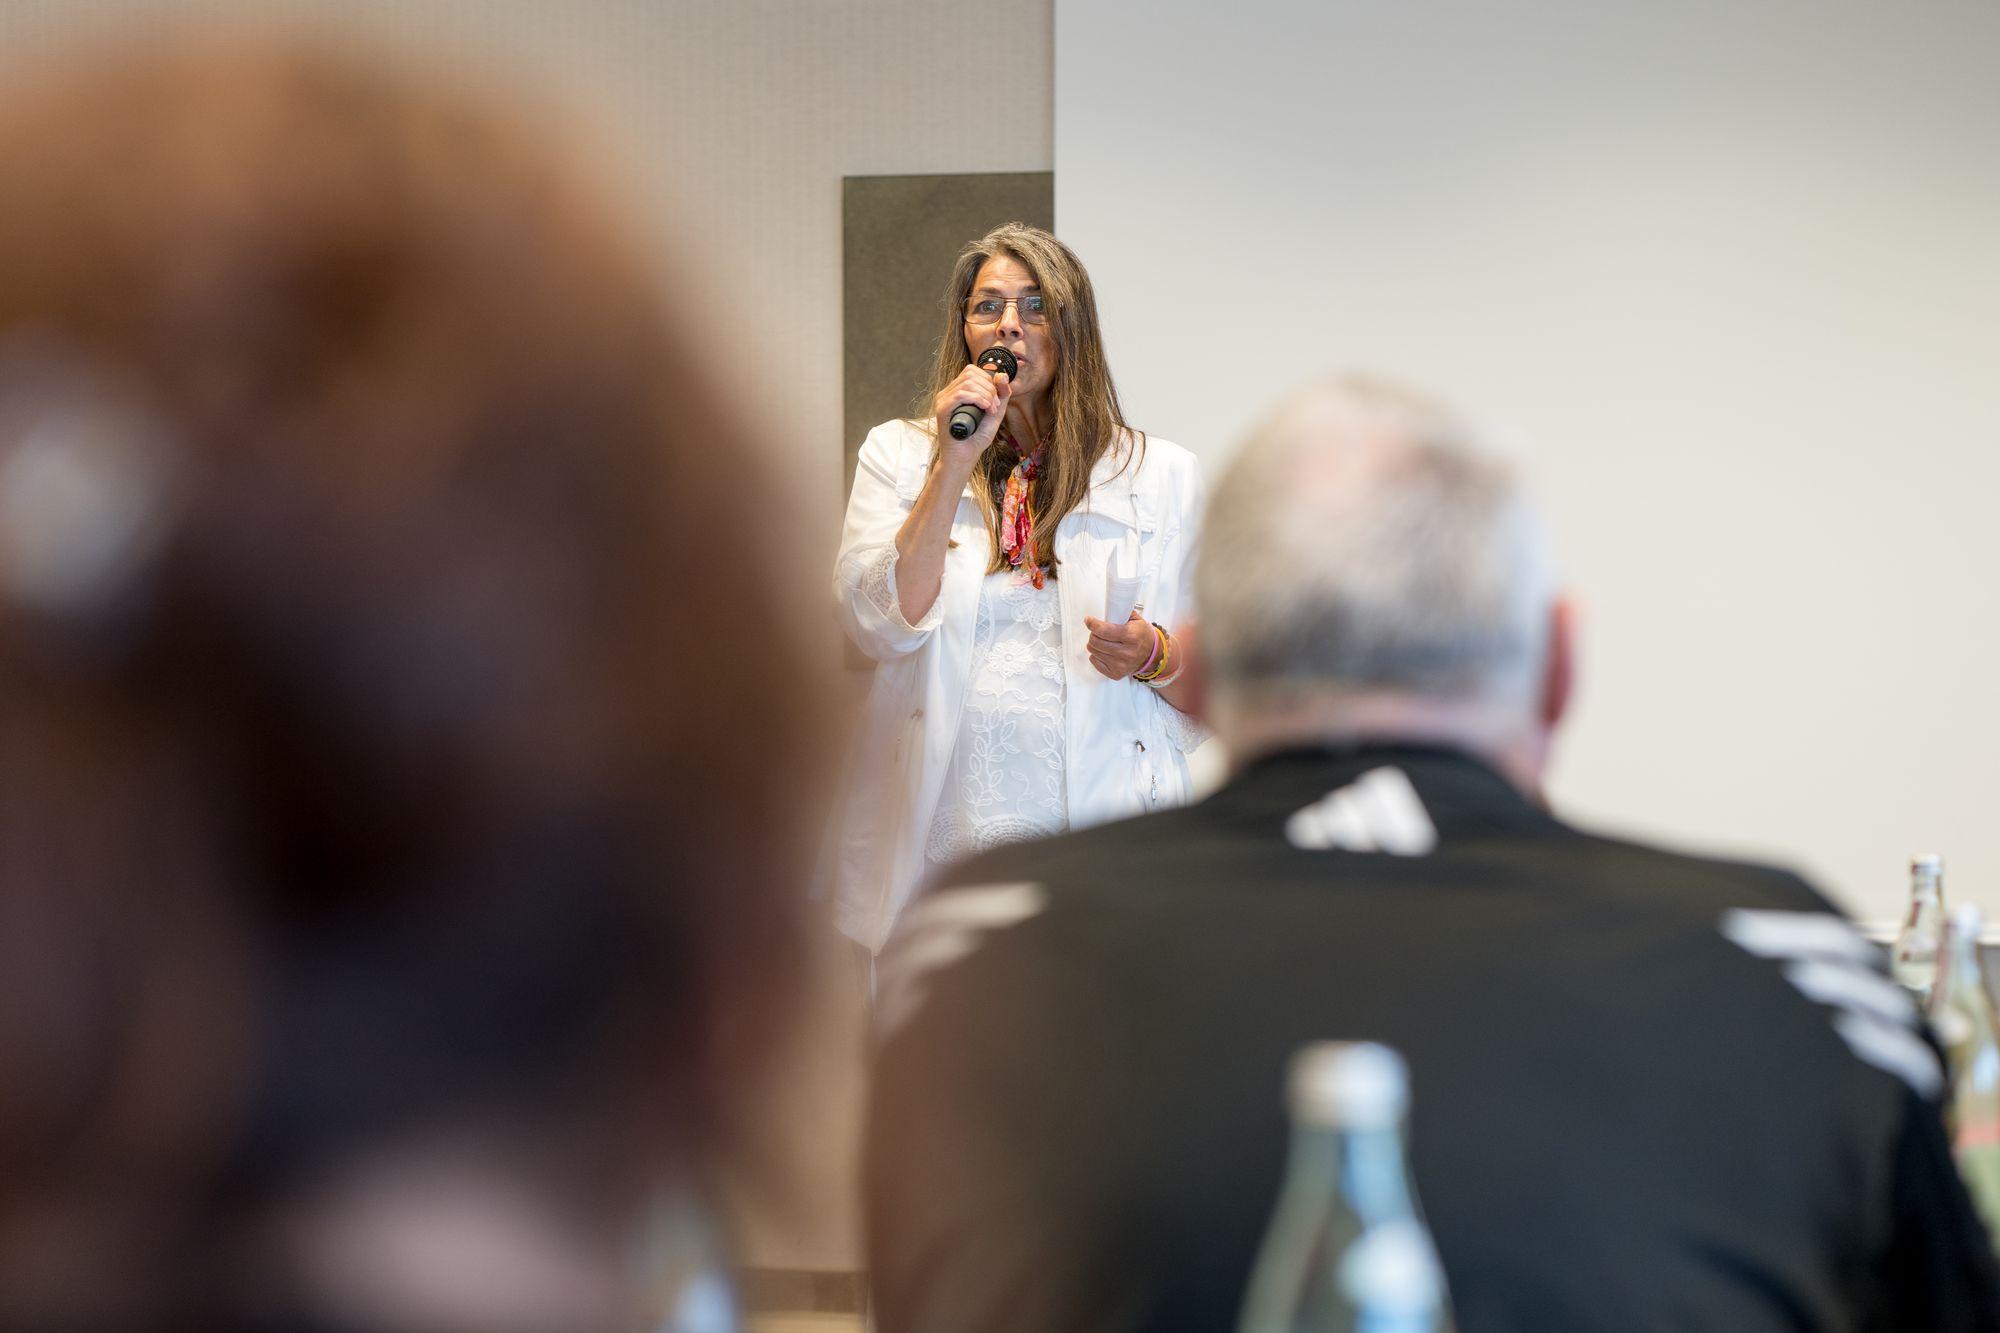 Astrid Neitzke als Sprecher auf dem Builderall Everest 2019 in Nürnberg (Germany)